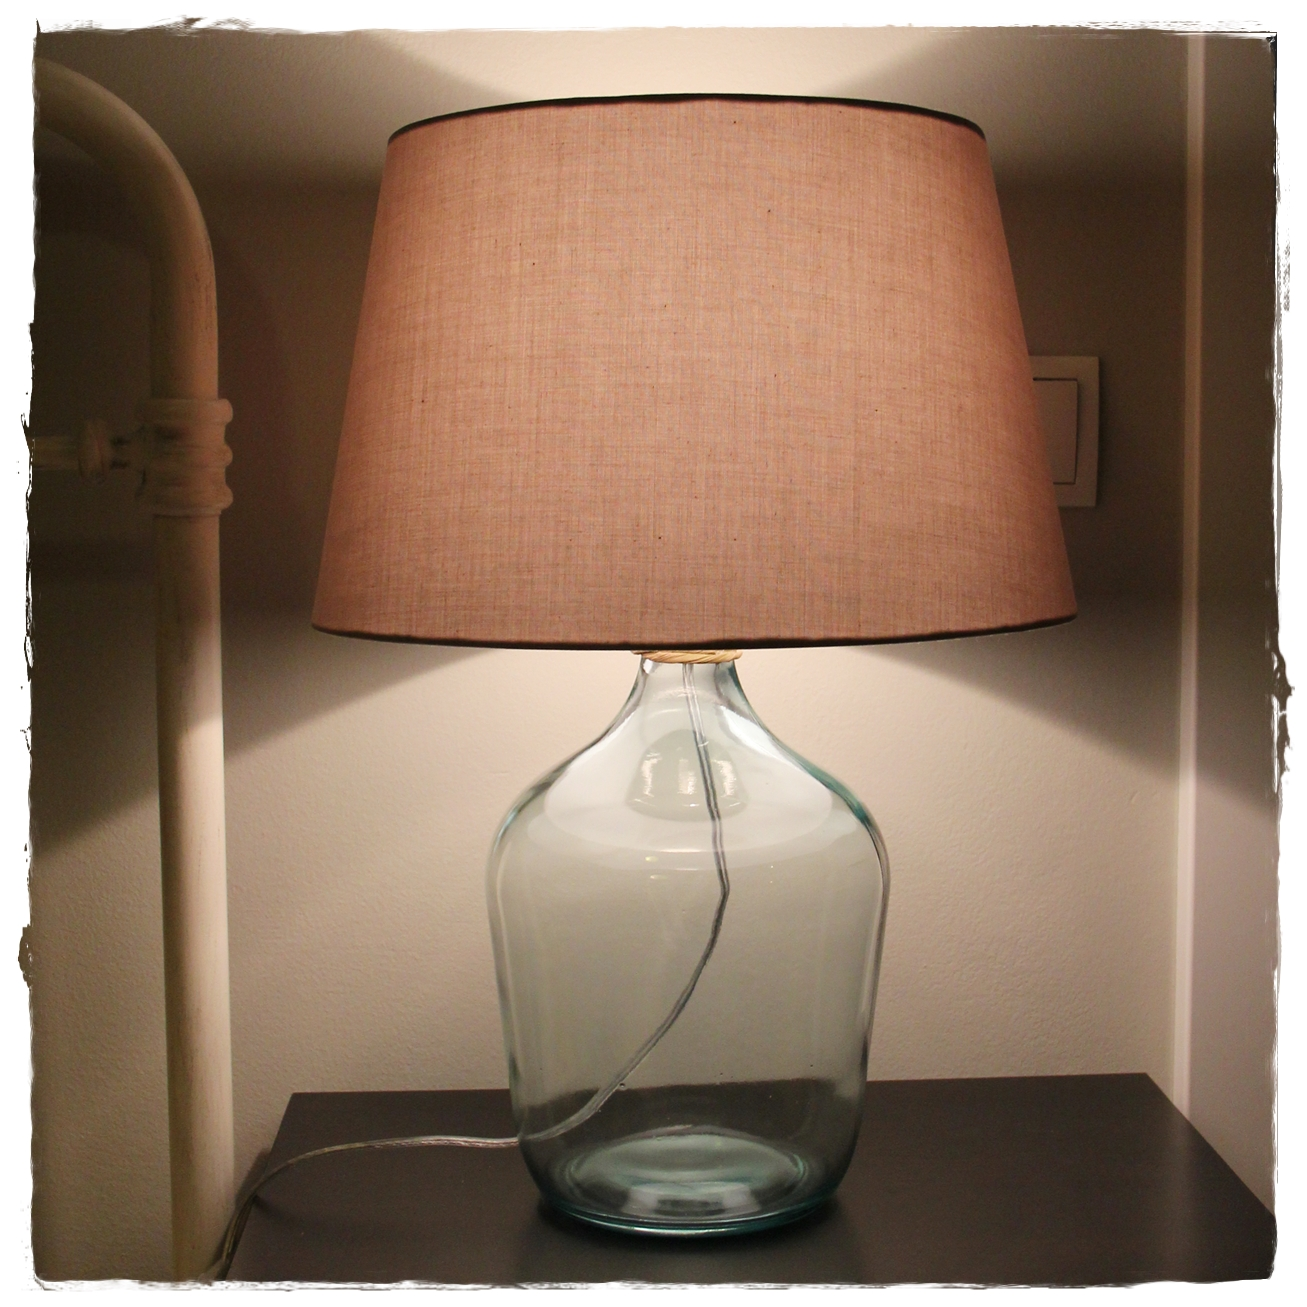 Brand new Glass Jug Lamp – Seepocke DG79